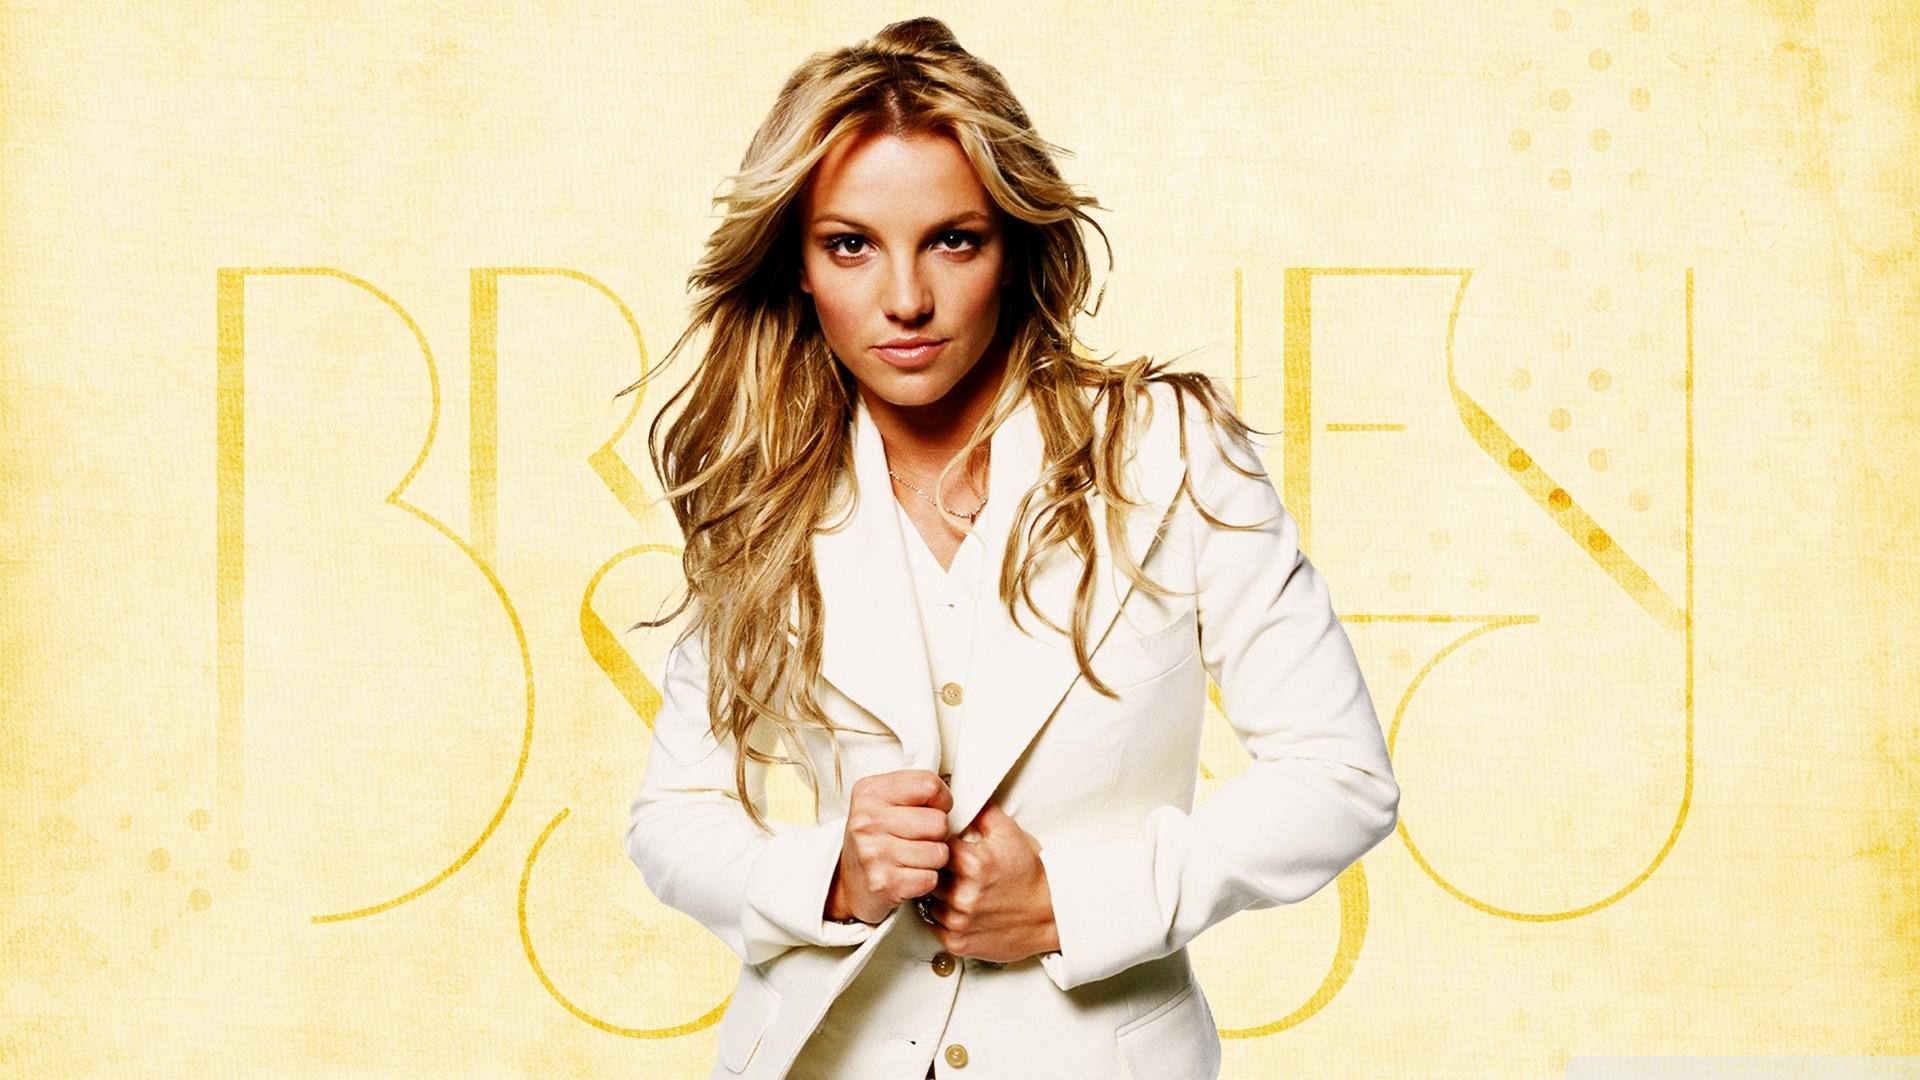 Britney Spears Wallpaper 34